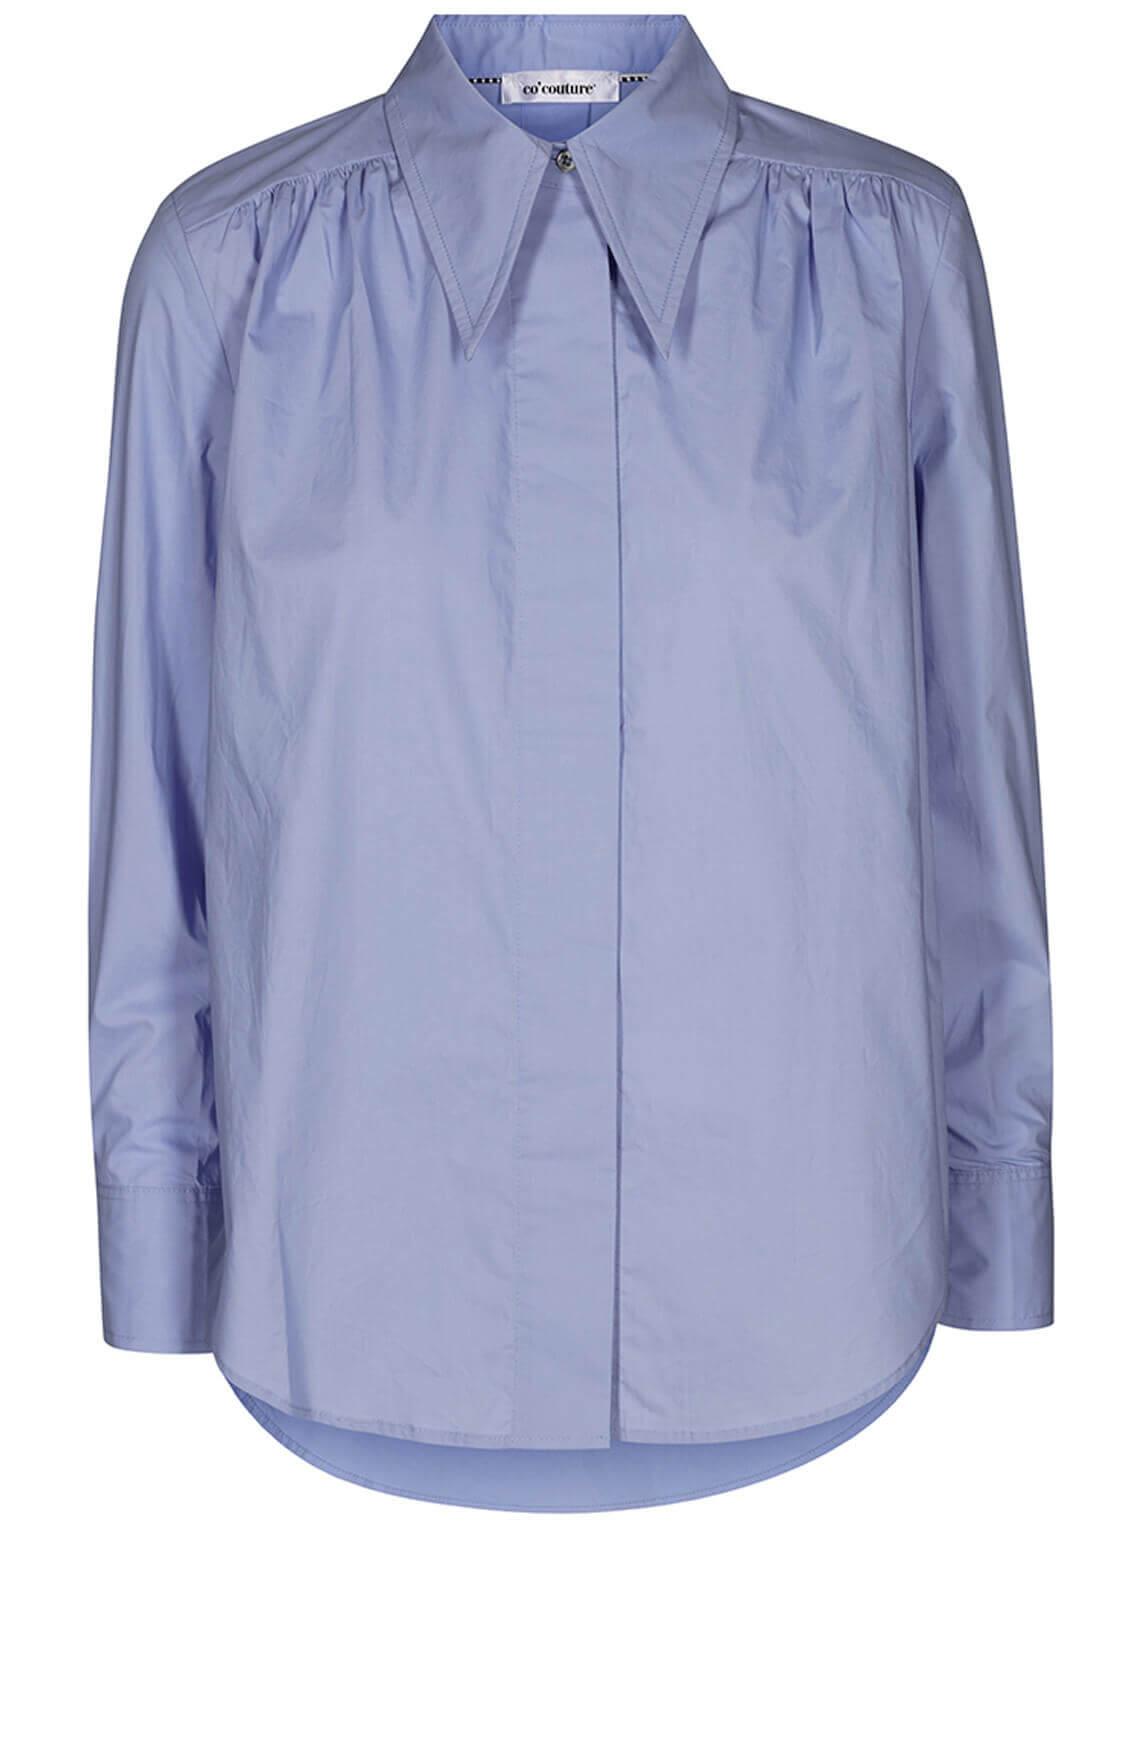 Co Couture Dames Coriolis blouse Blauw